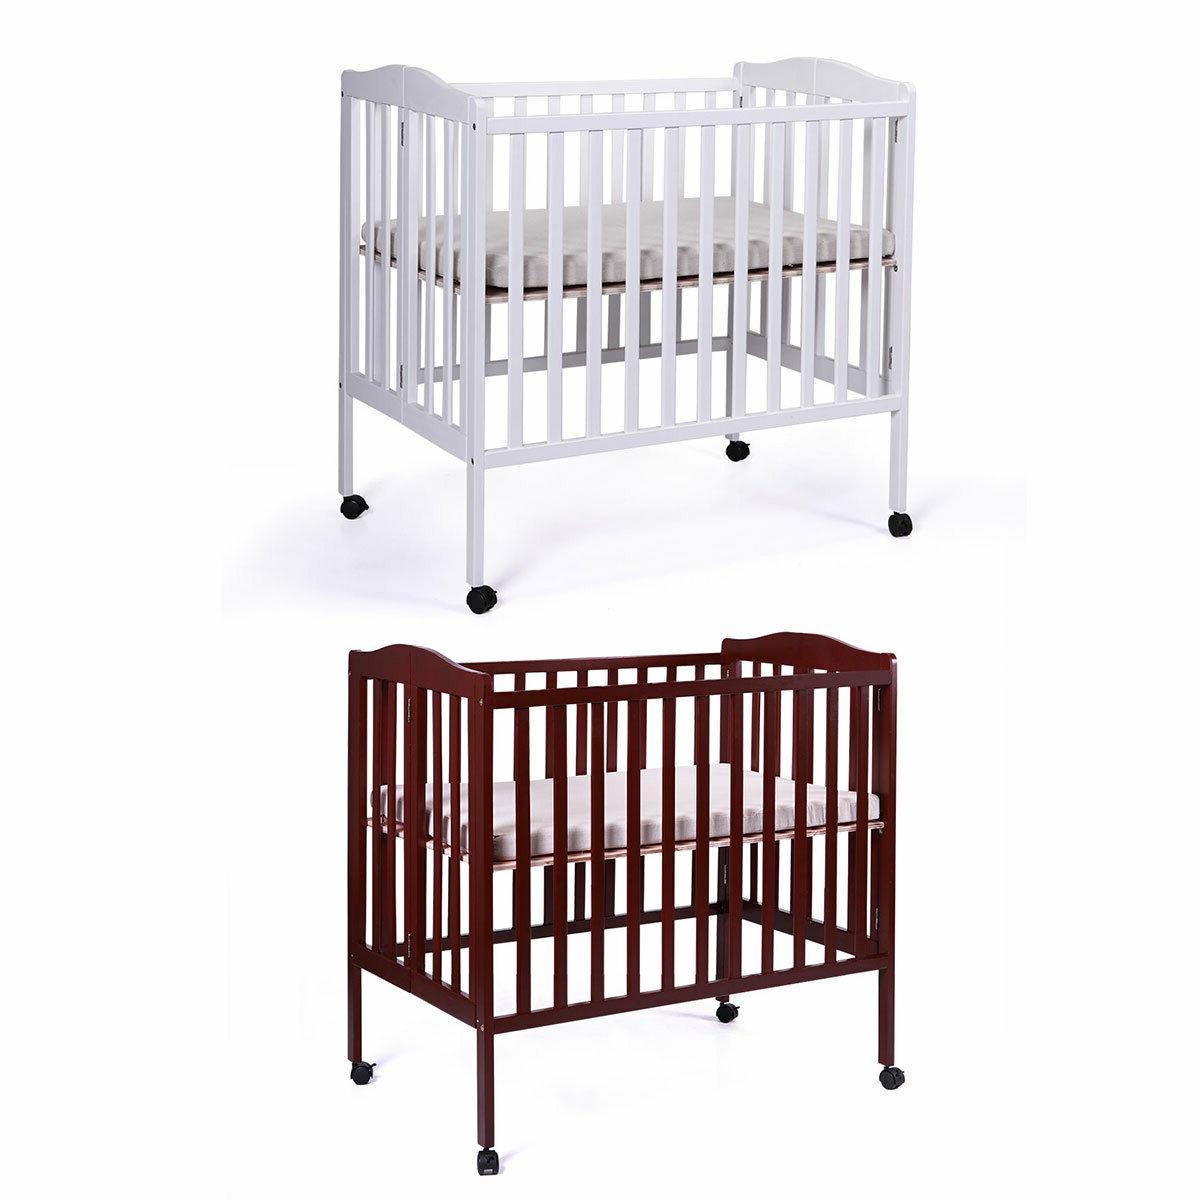 TOBBI-SAFE Baby Nursery Crib Bed Wood Infant